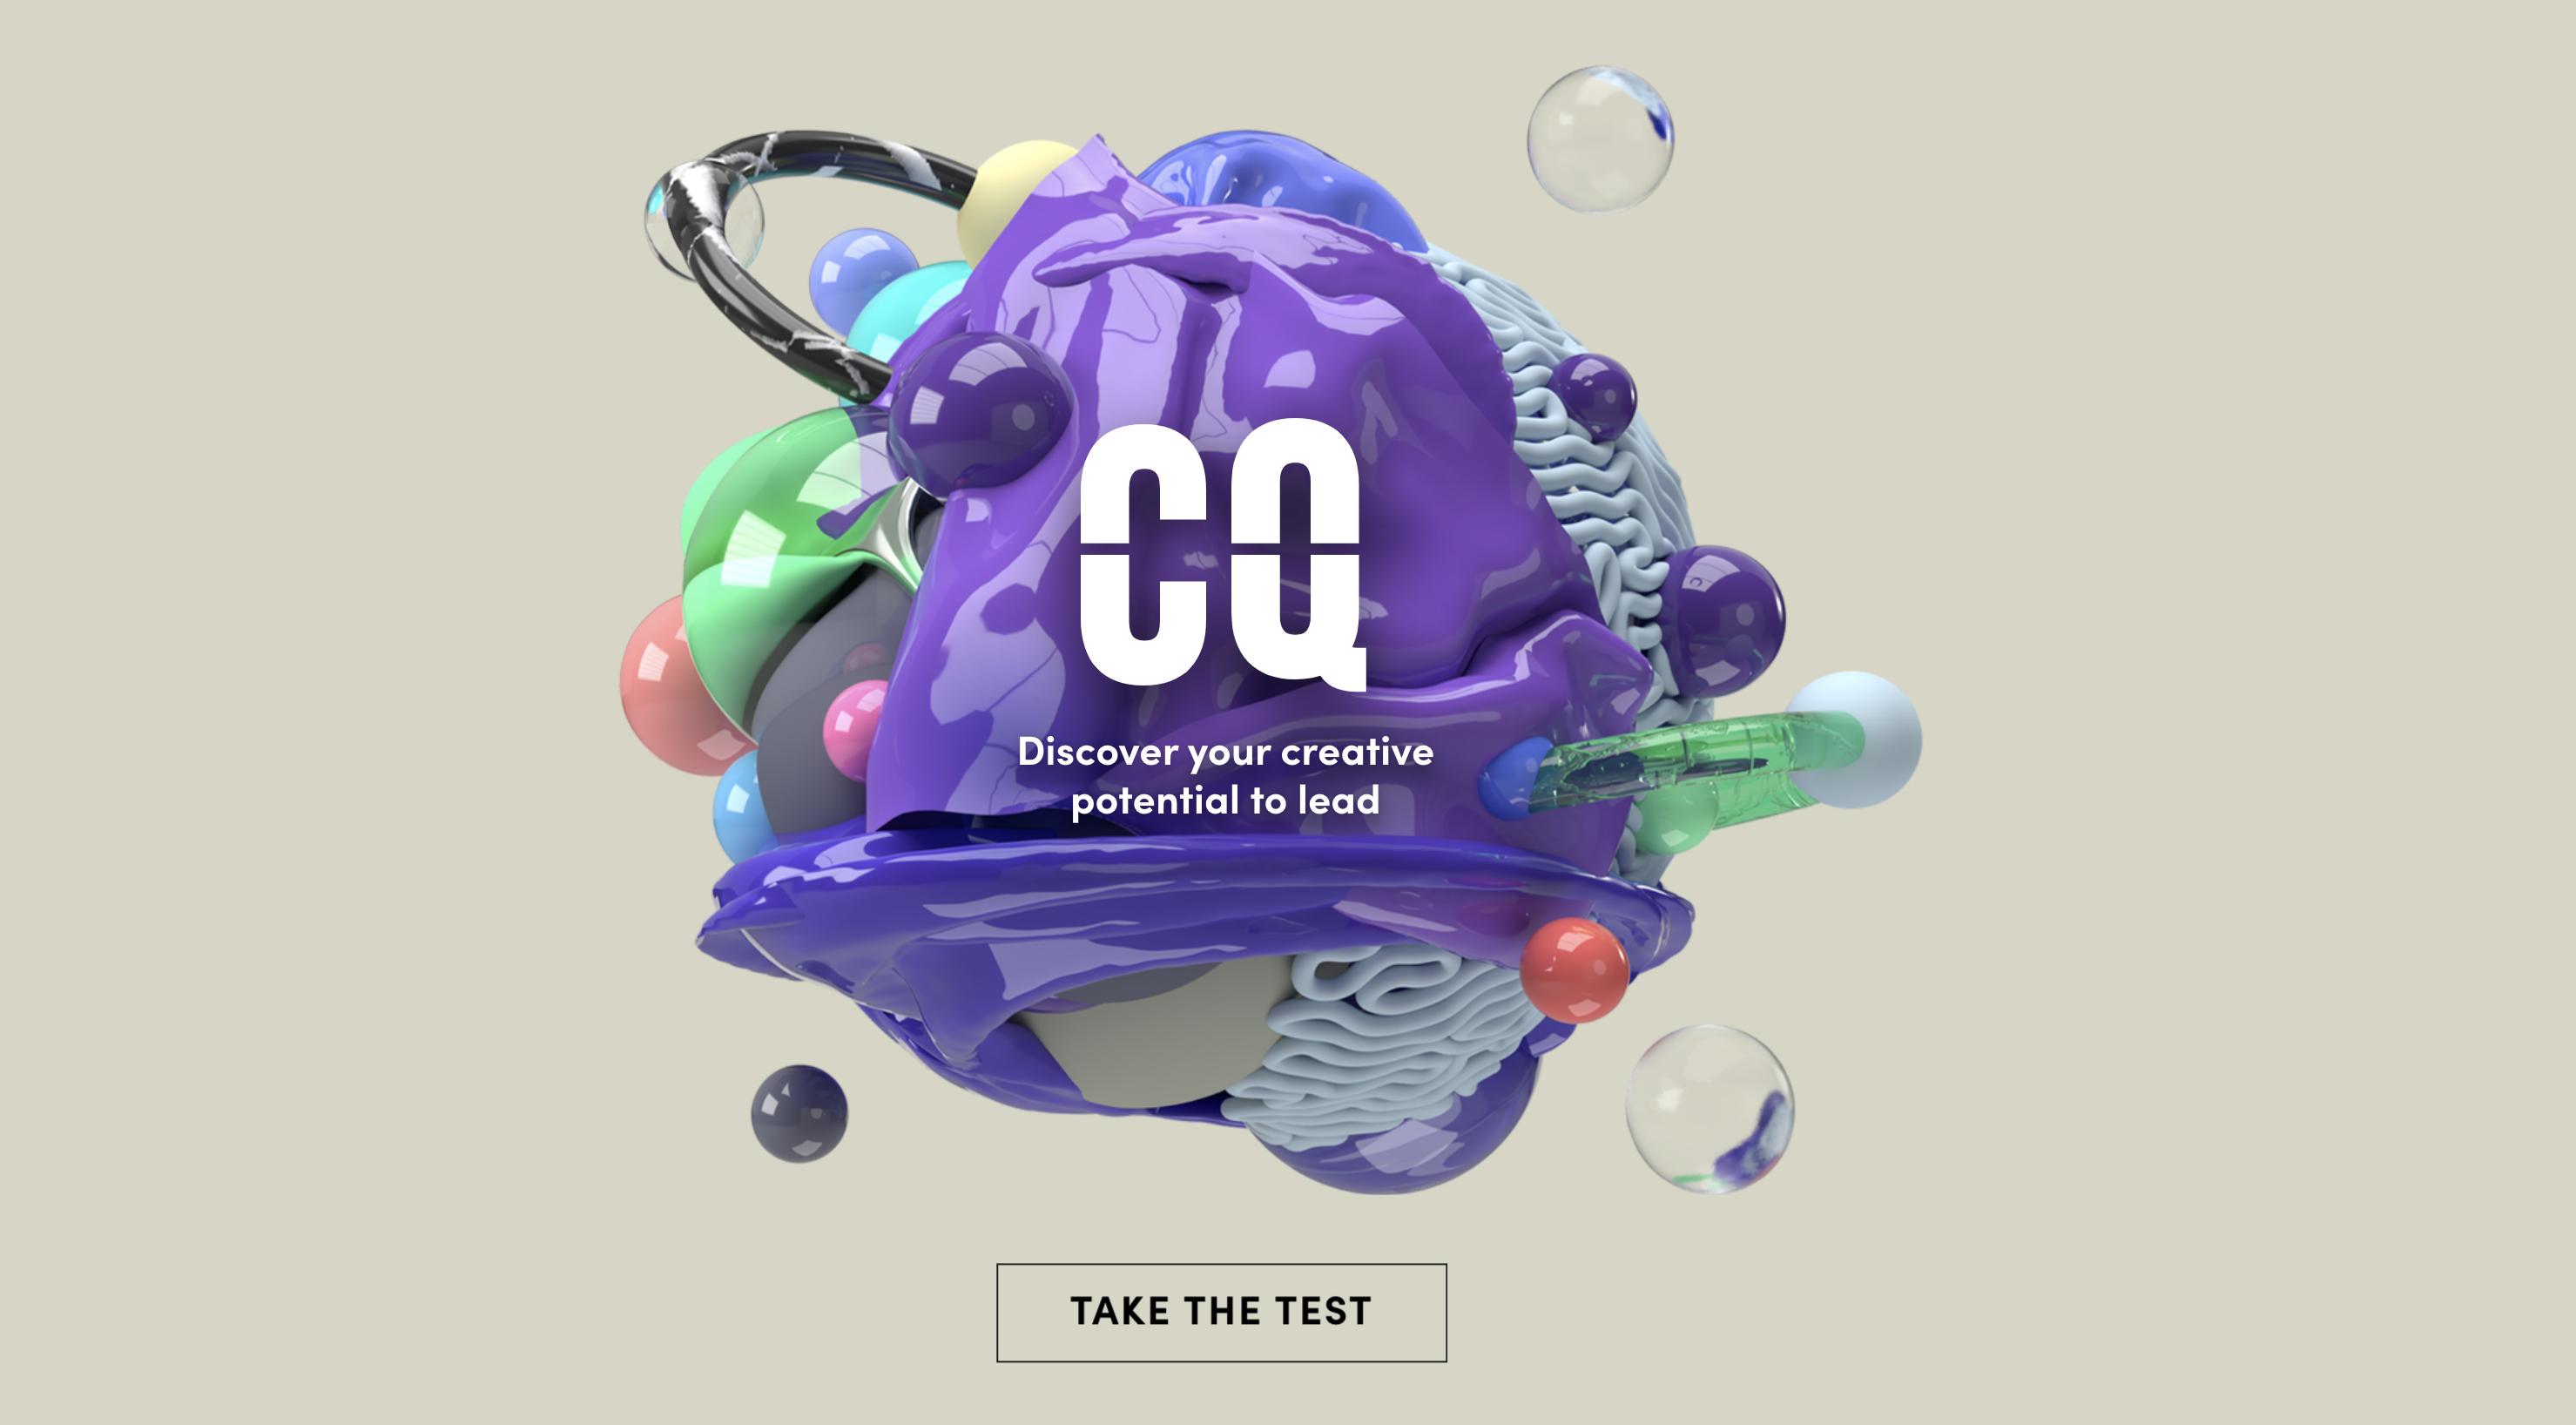 Adobe CQ Futurist Anders Sorman-Nilsson